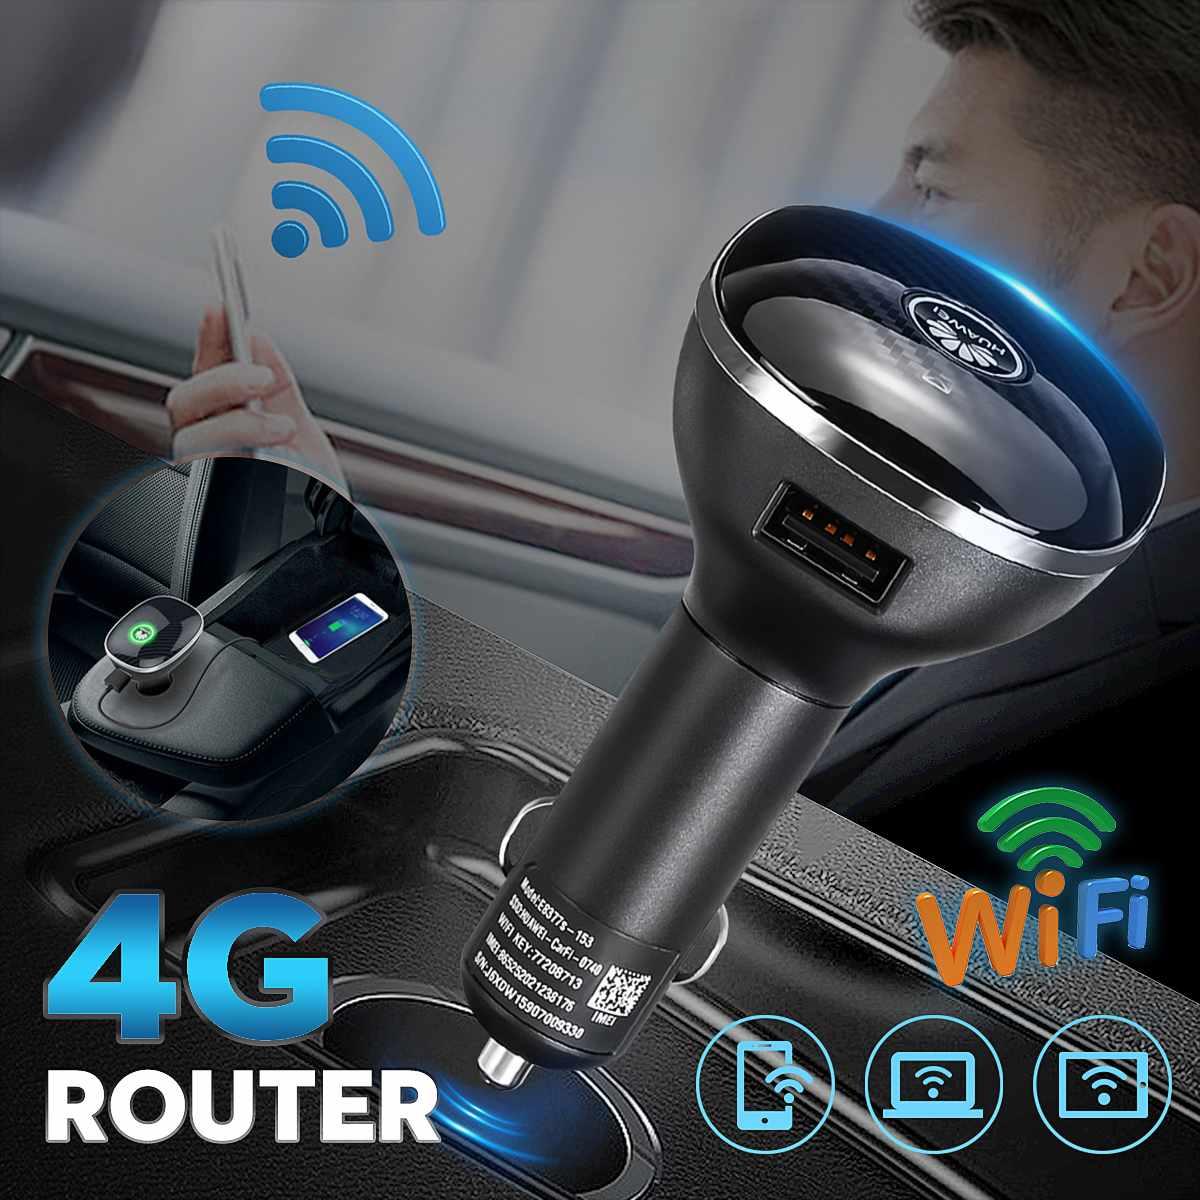 unlocked-4g lte CPE car wifi router CarFi E8377 fdd all band LTE Hotspot dongle 4G LTE Cat5 Car Wifi modem pk e5172 b593unlocked-4g lte CPE car wifi router CarFi E8377 fdd all band LTE Hotspot dongle 4G LTE Cat5 Car Wifi modem pk e5172 b593